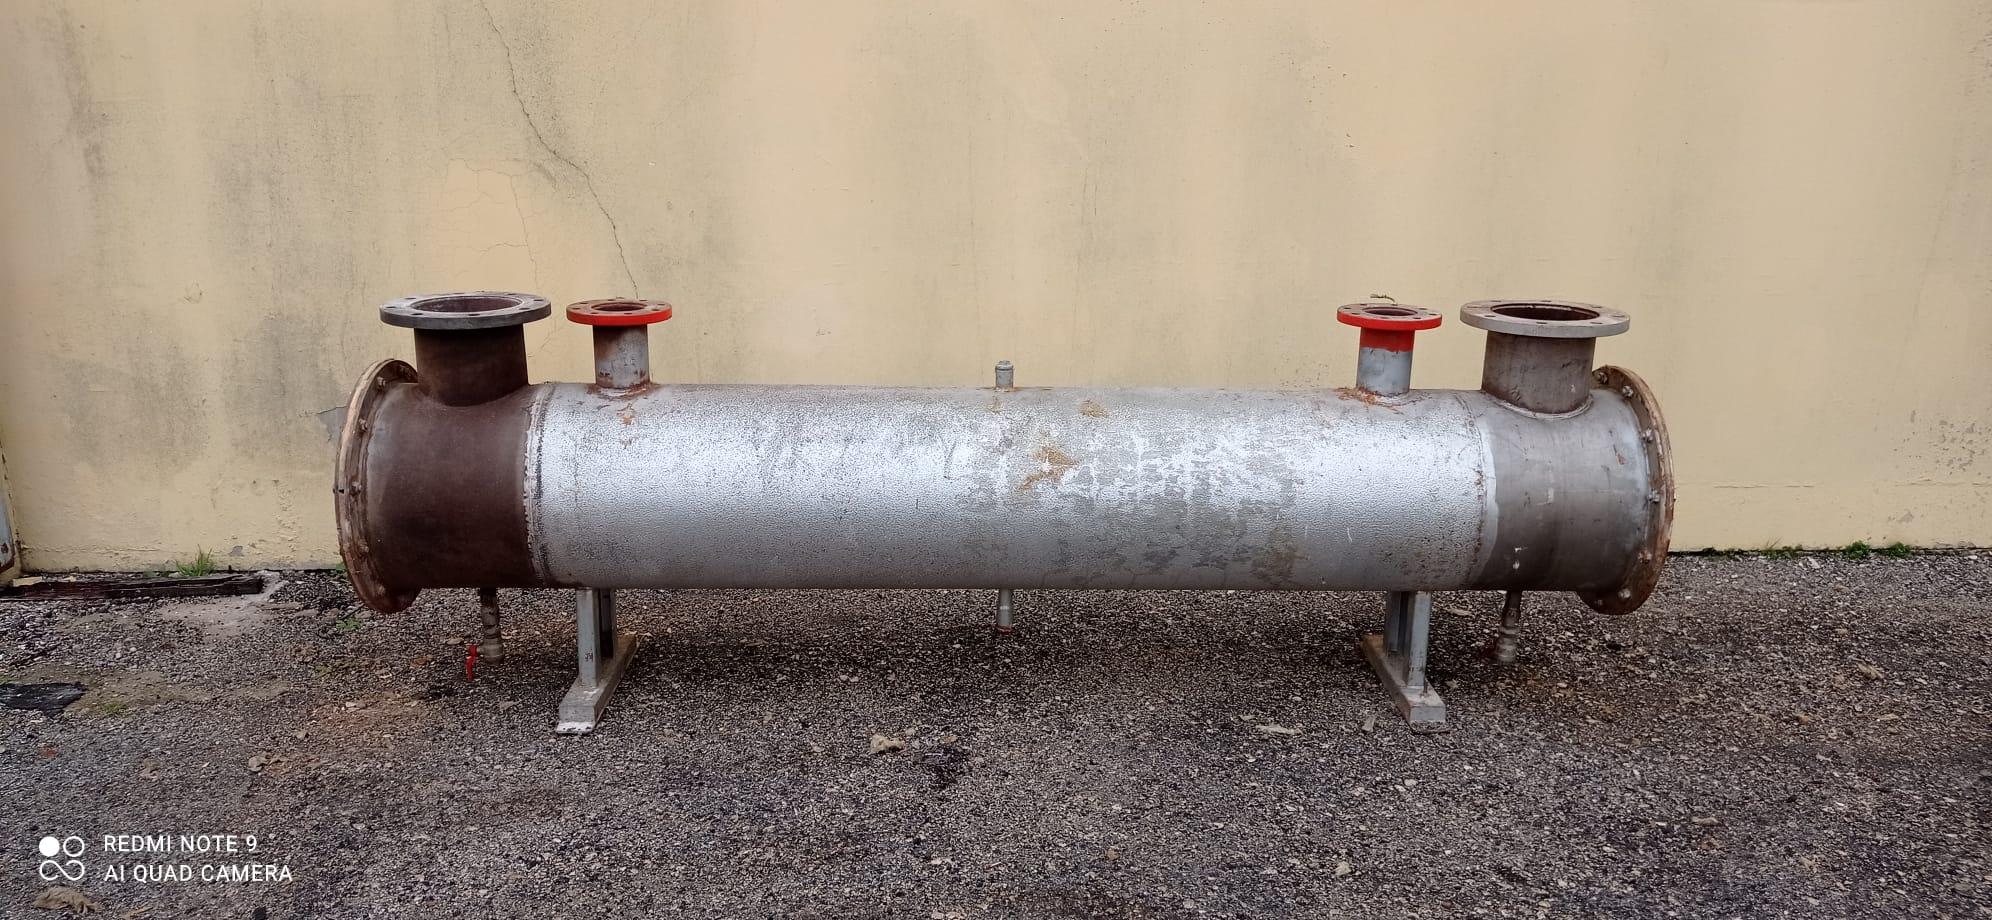 Scambiatore di calore in vendita - foto 1